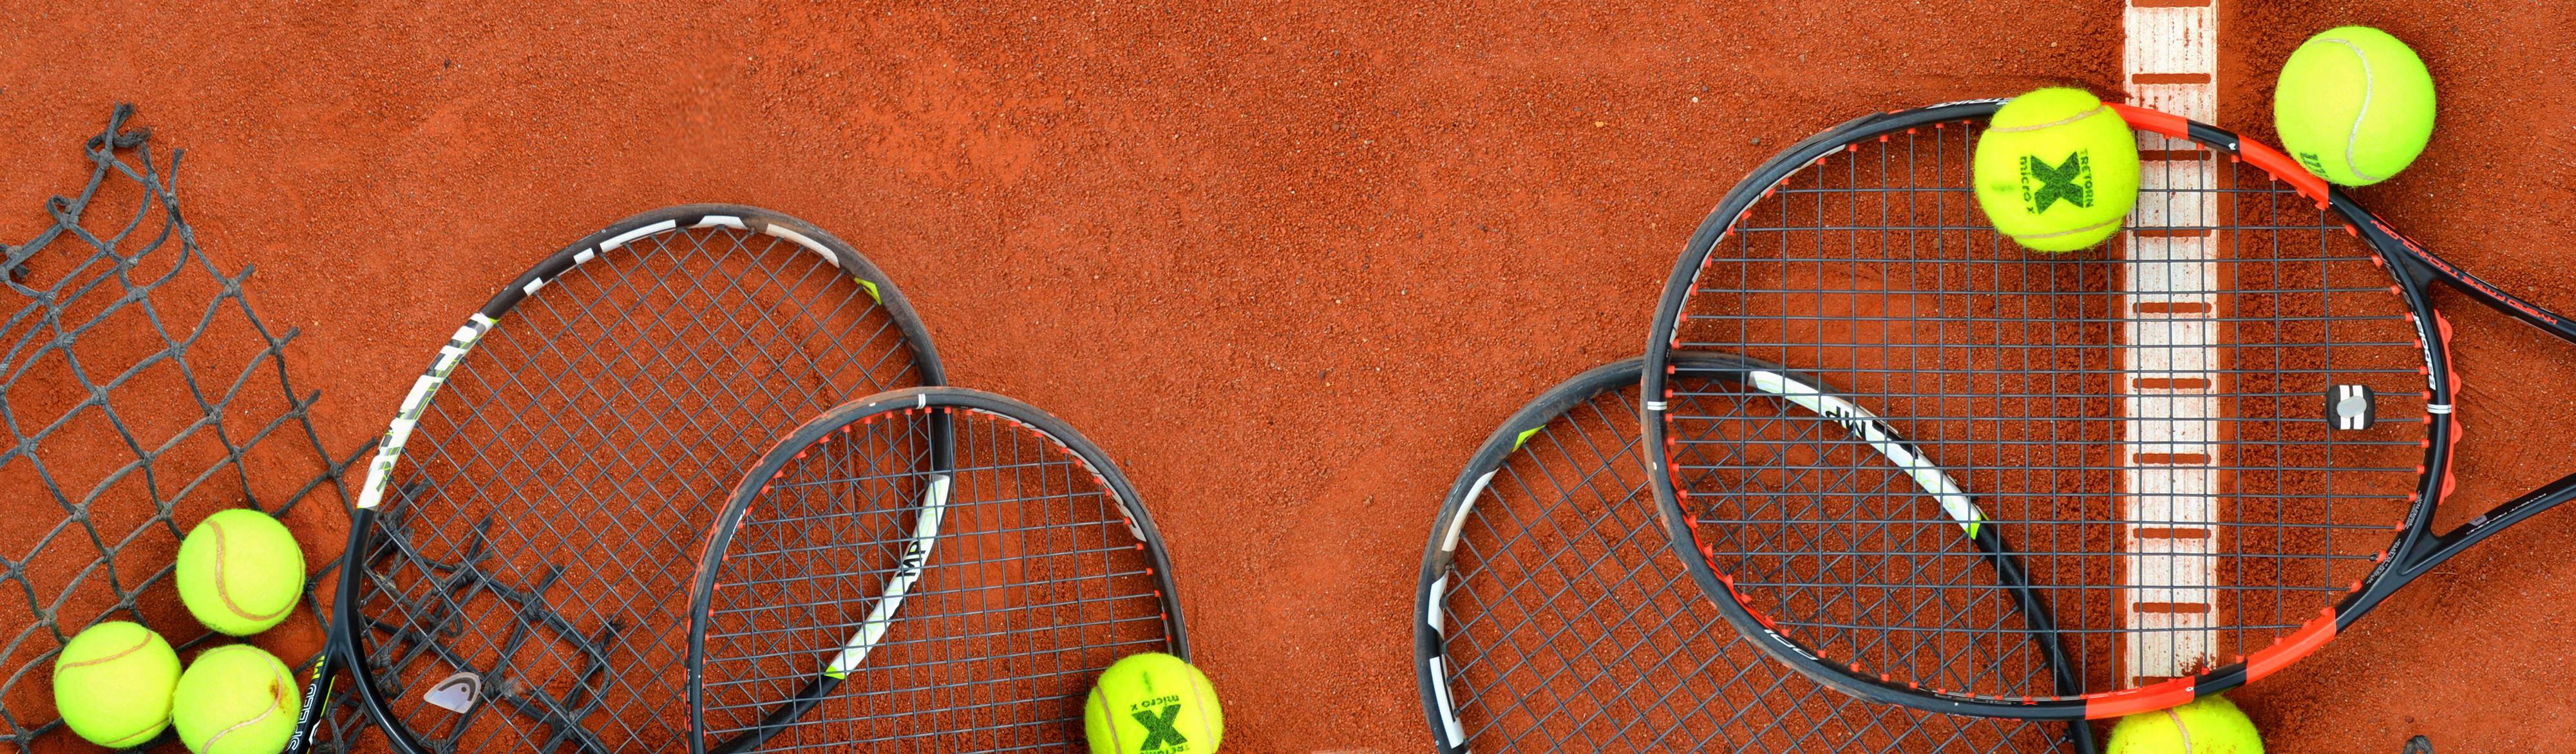 tennis_groß